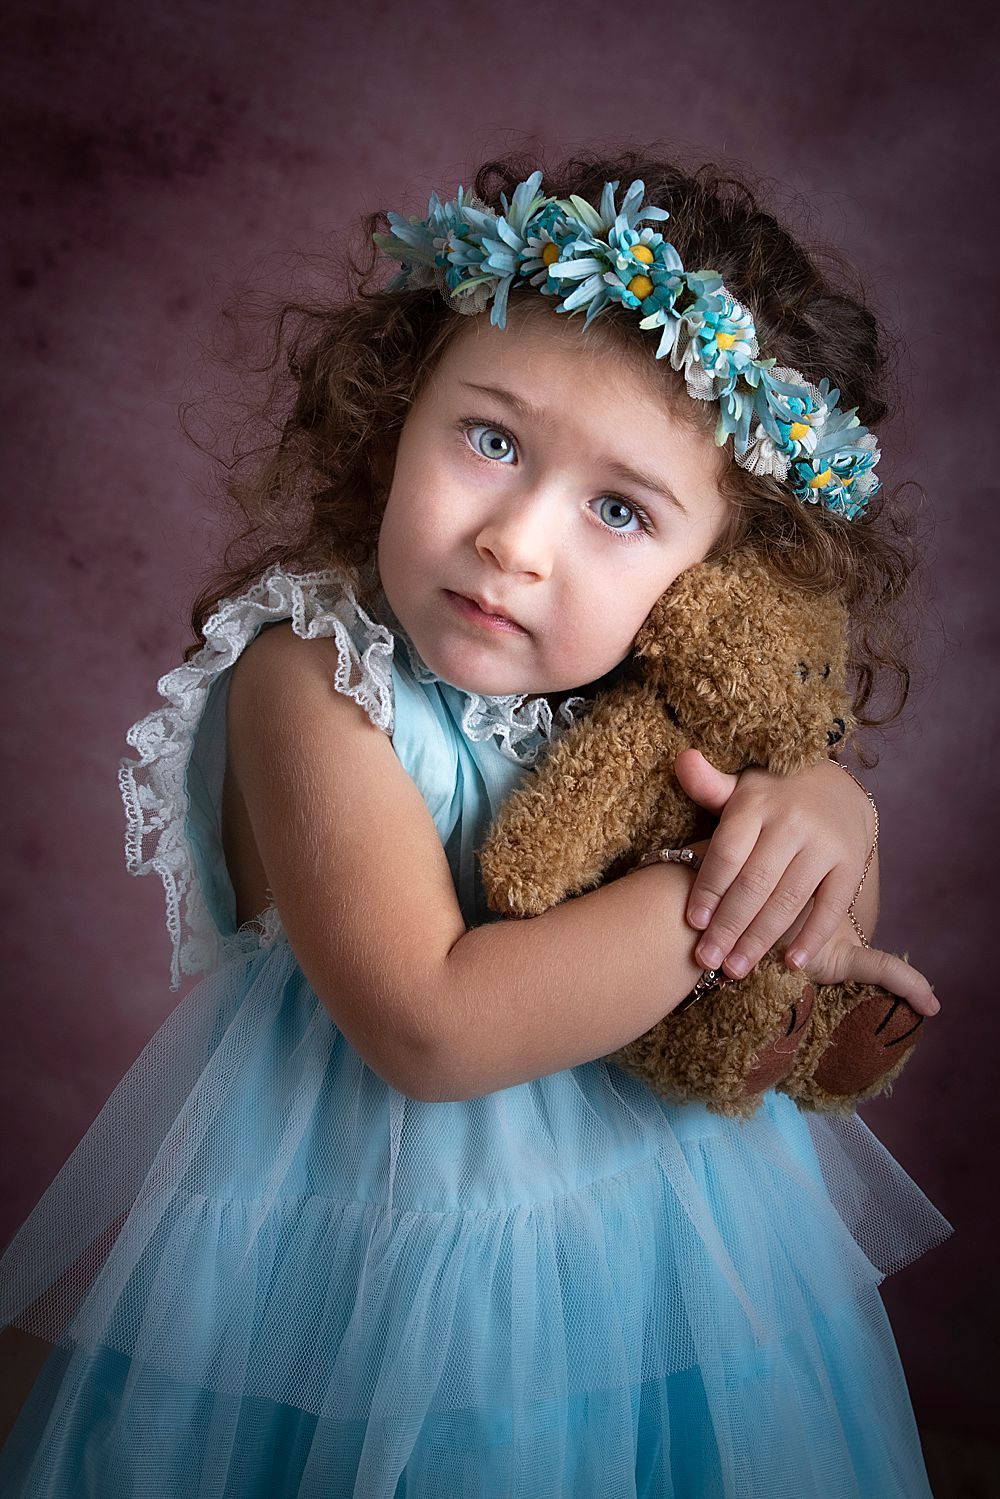 fotografo-bambini-poggibonsi-laura-caini